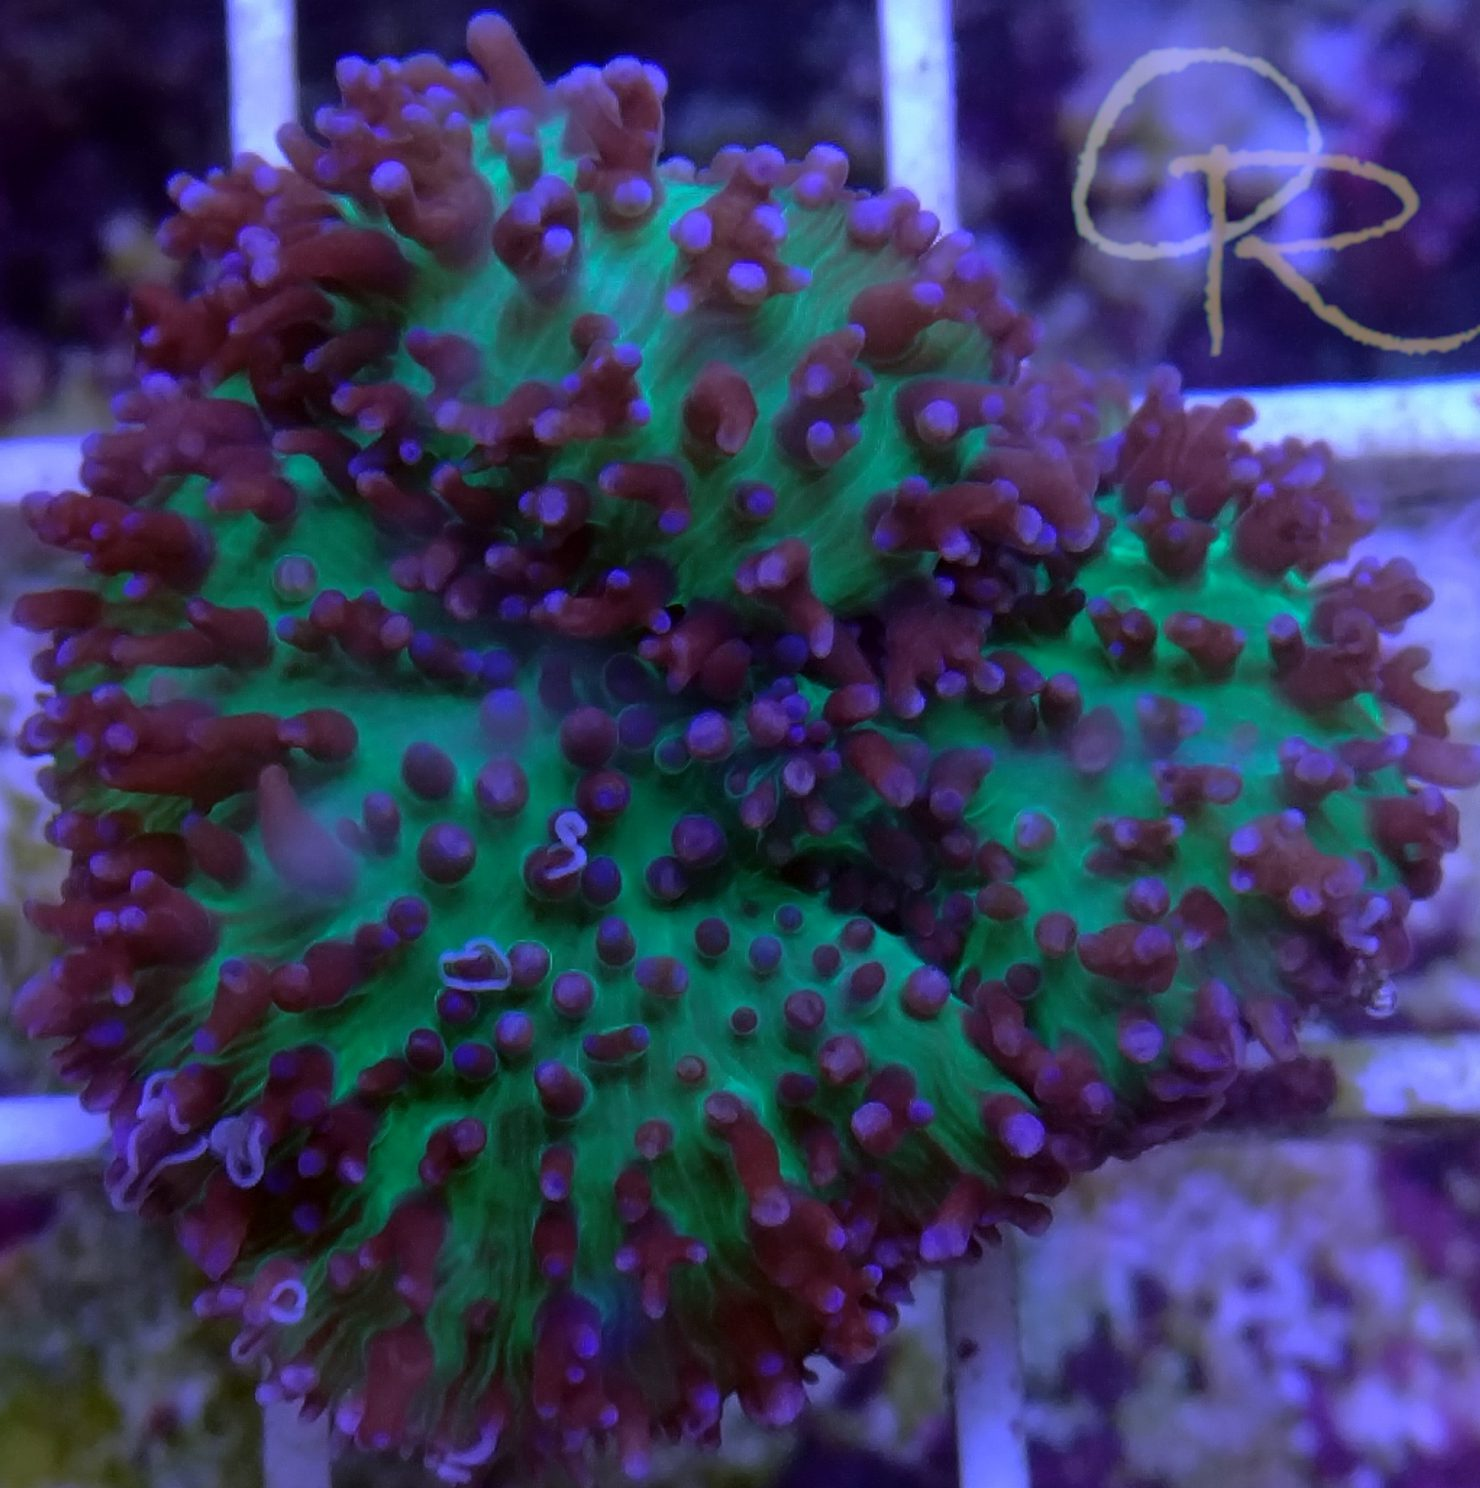 Hairy Green & Purple Mushroom Coral